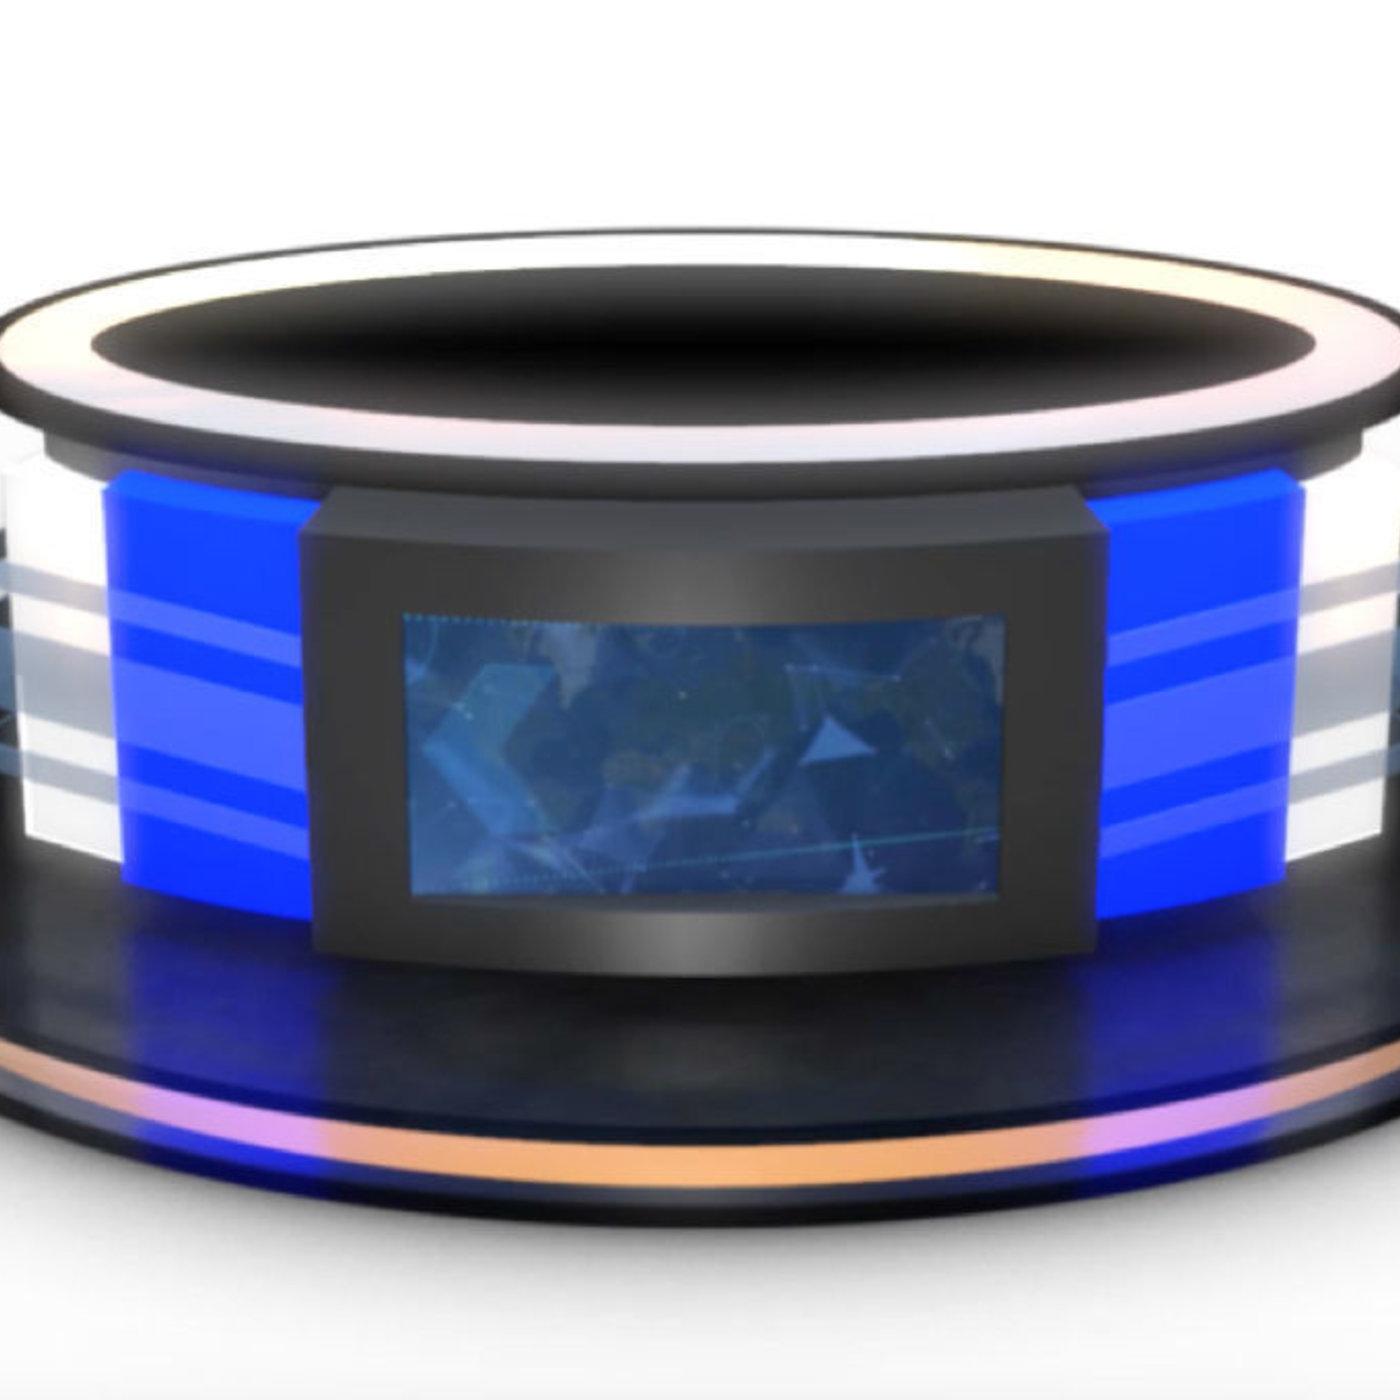 3D TV Studio News Desk 12